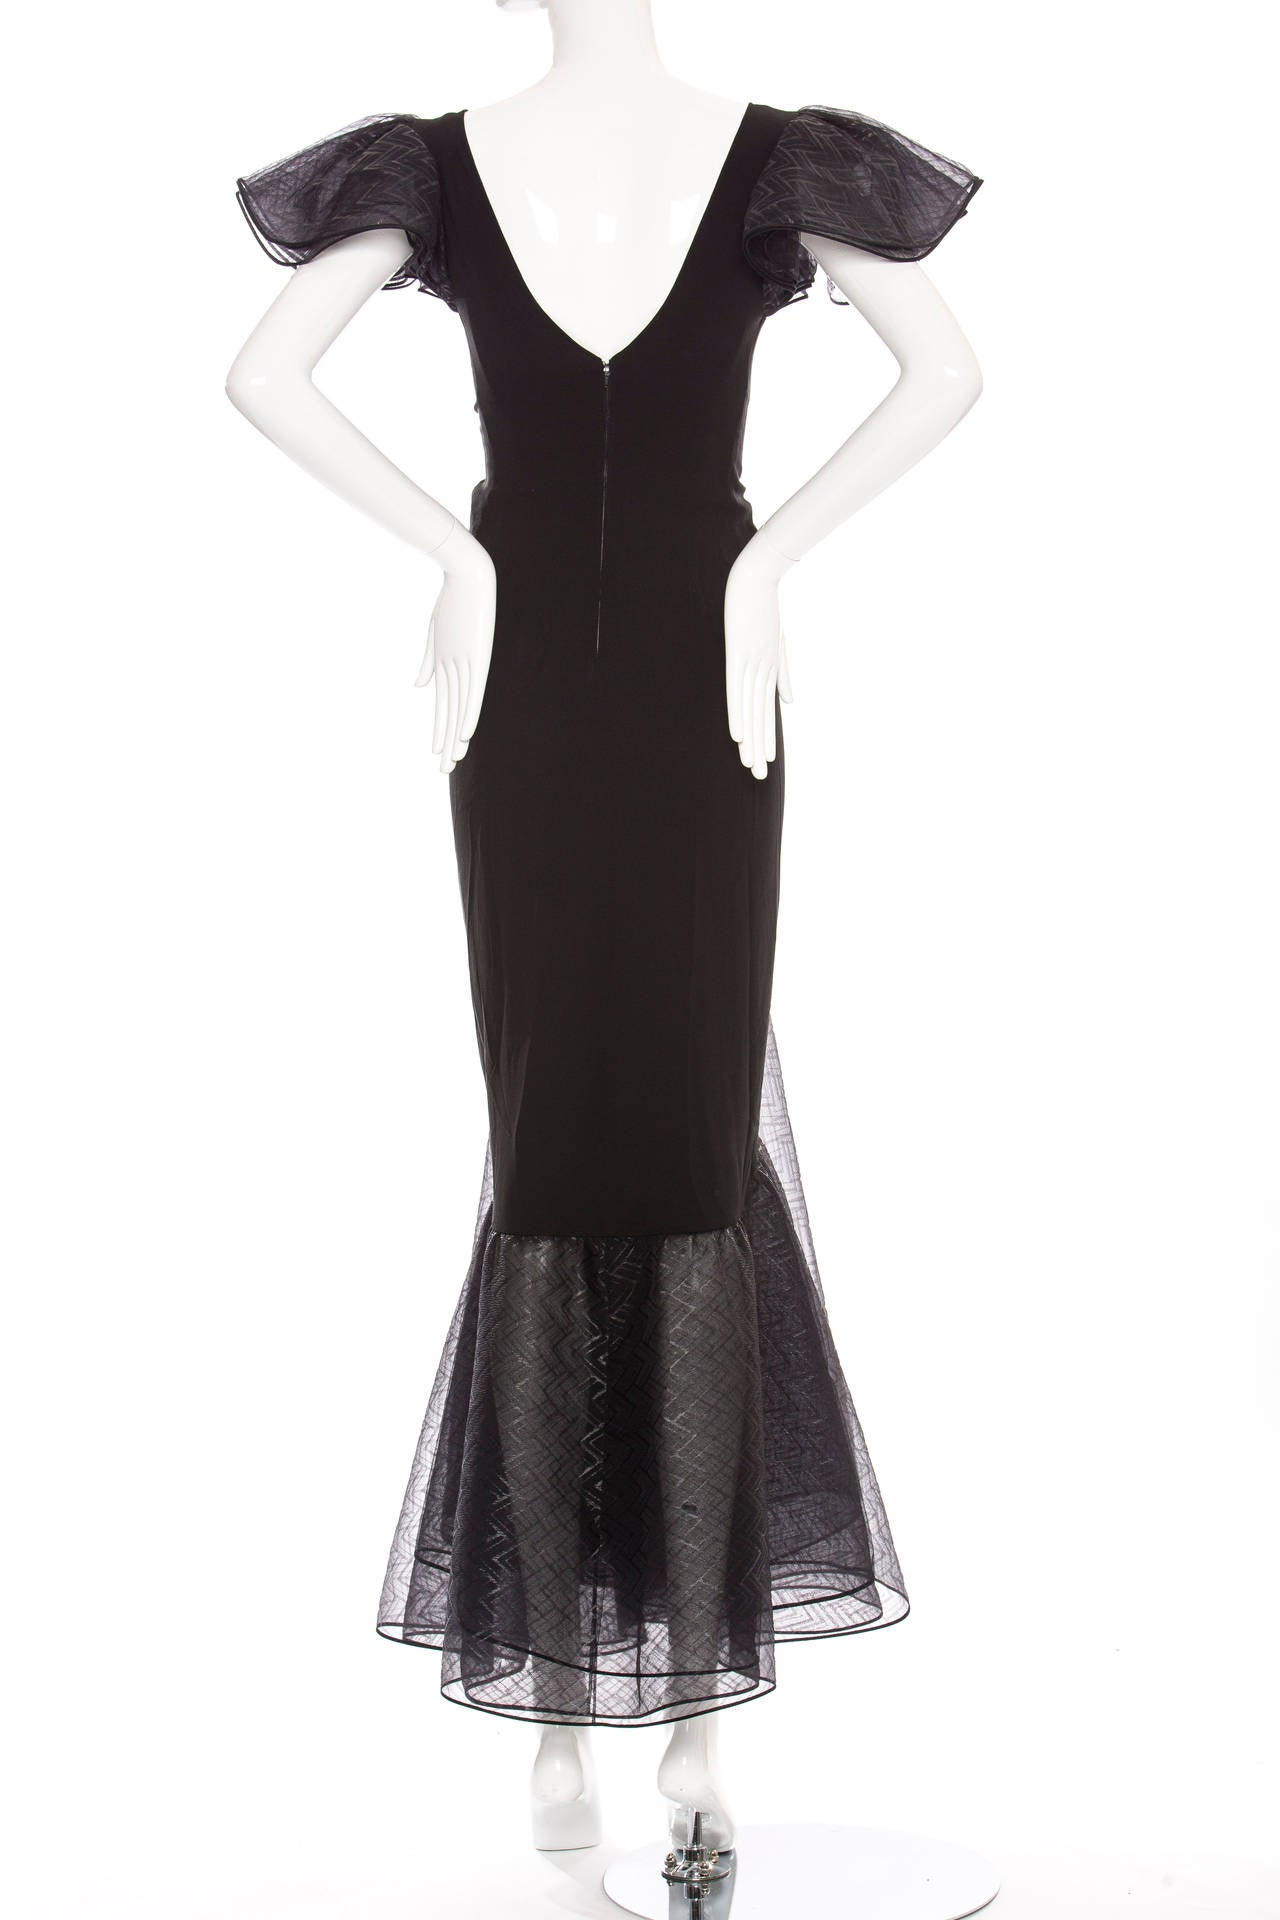 Valentino Haute Couture Silk Crepe And Printed Gazar Evening Dress, Circa 1980's 4